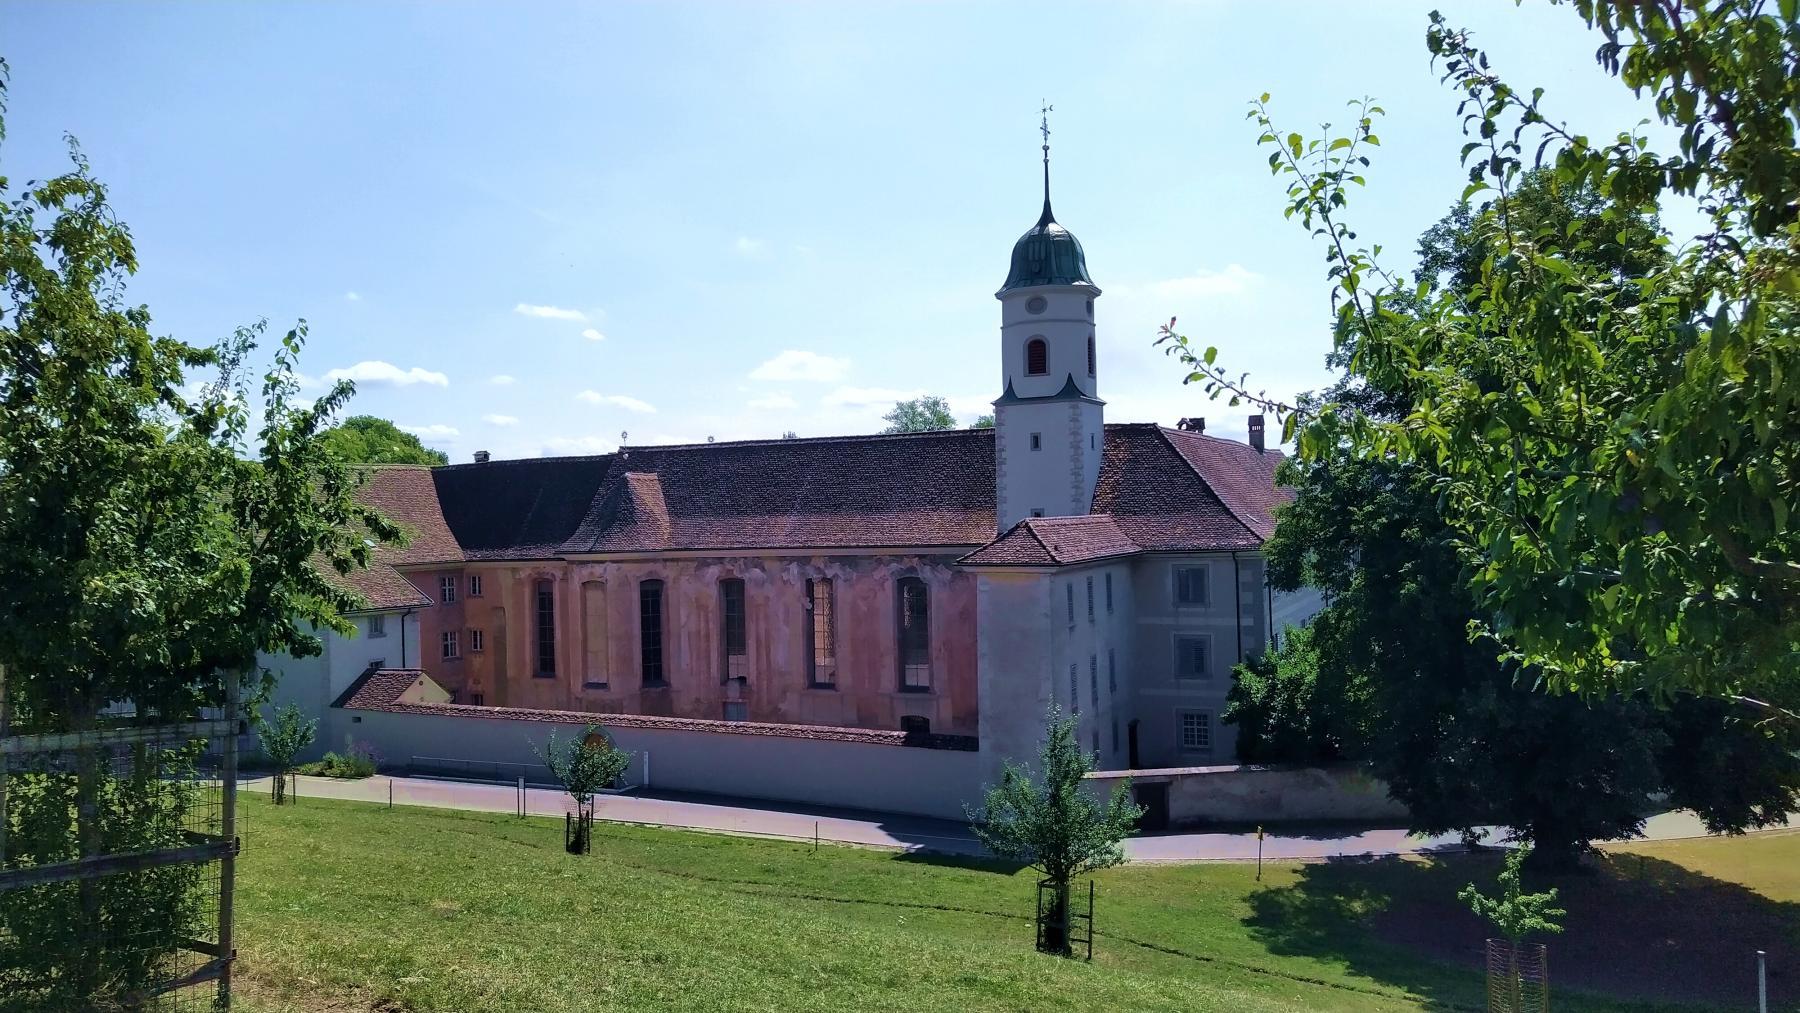 12a Kloster Fahr